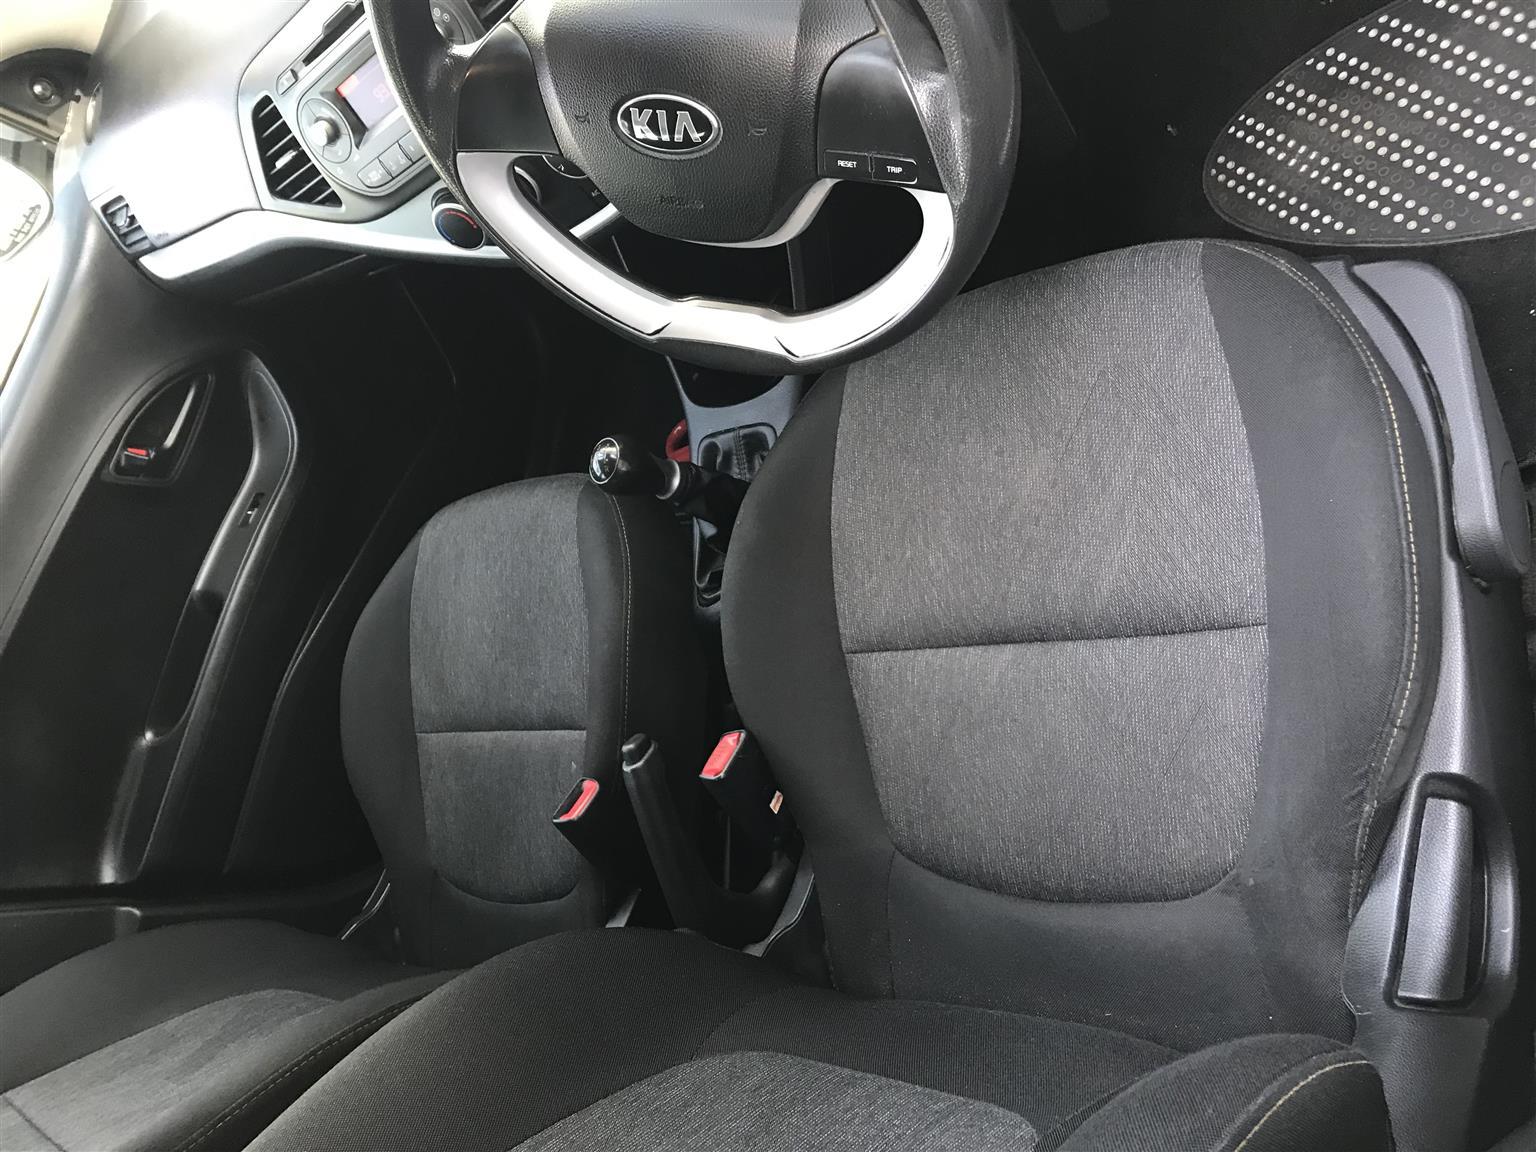 2015 Kia Picanto 1.0 LX